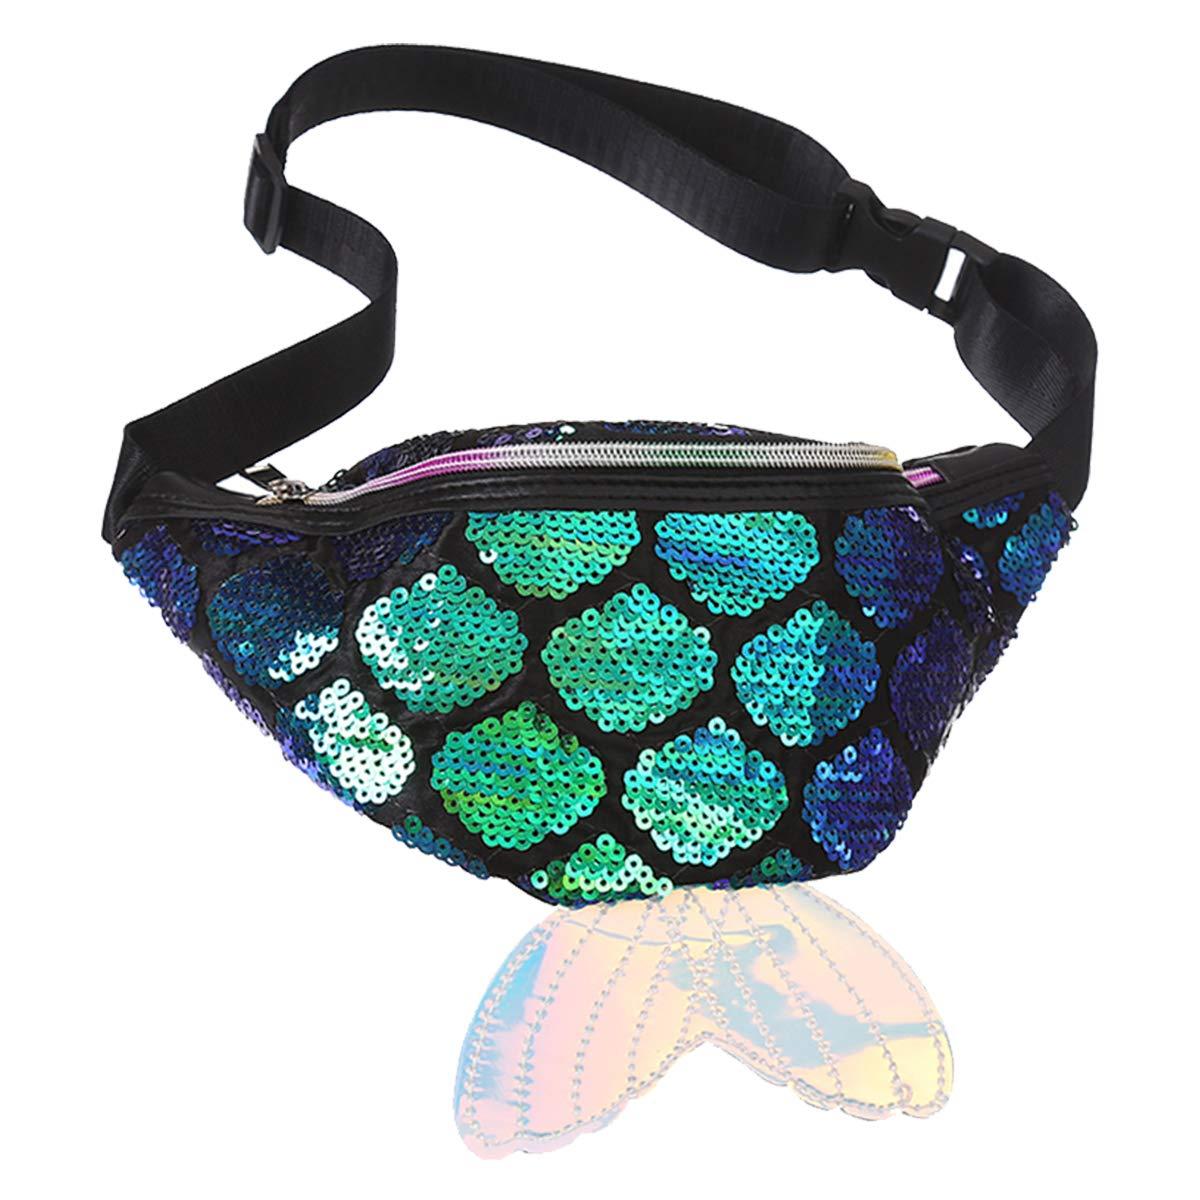 26949d28b3bd Fanny Pack for Kids,LIVEBOX Mermaid Sequin Waist Bag Girl Reversible Waist  Pack Glitter Sling Bag with Adjustable Belt for Beach Travel, Party, ...